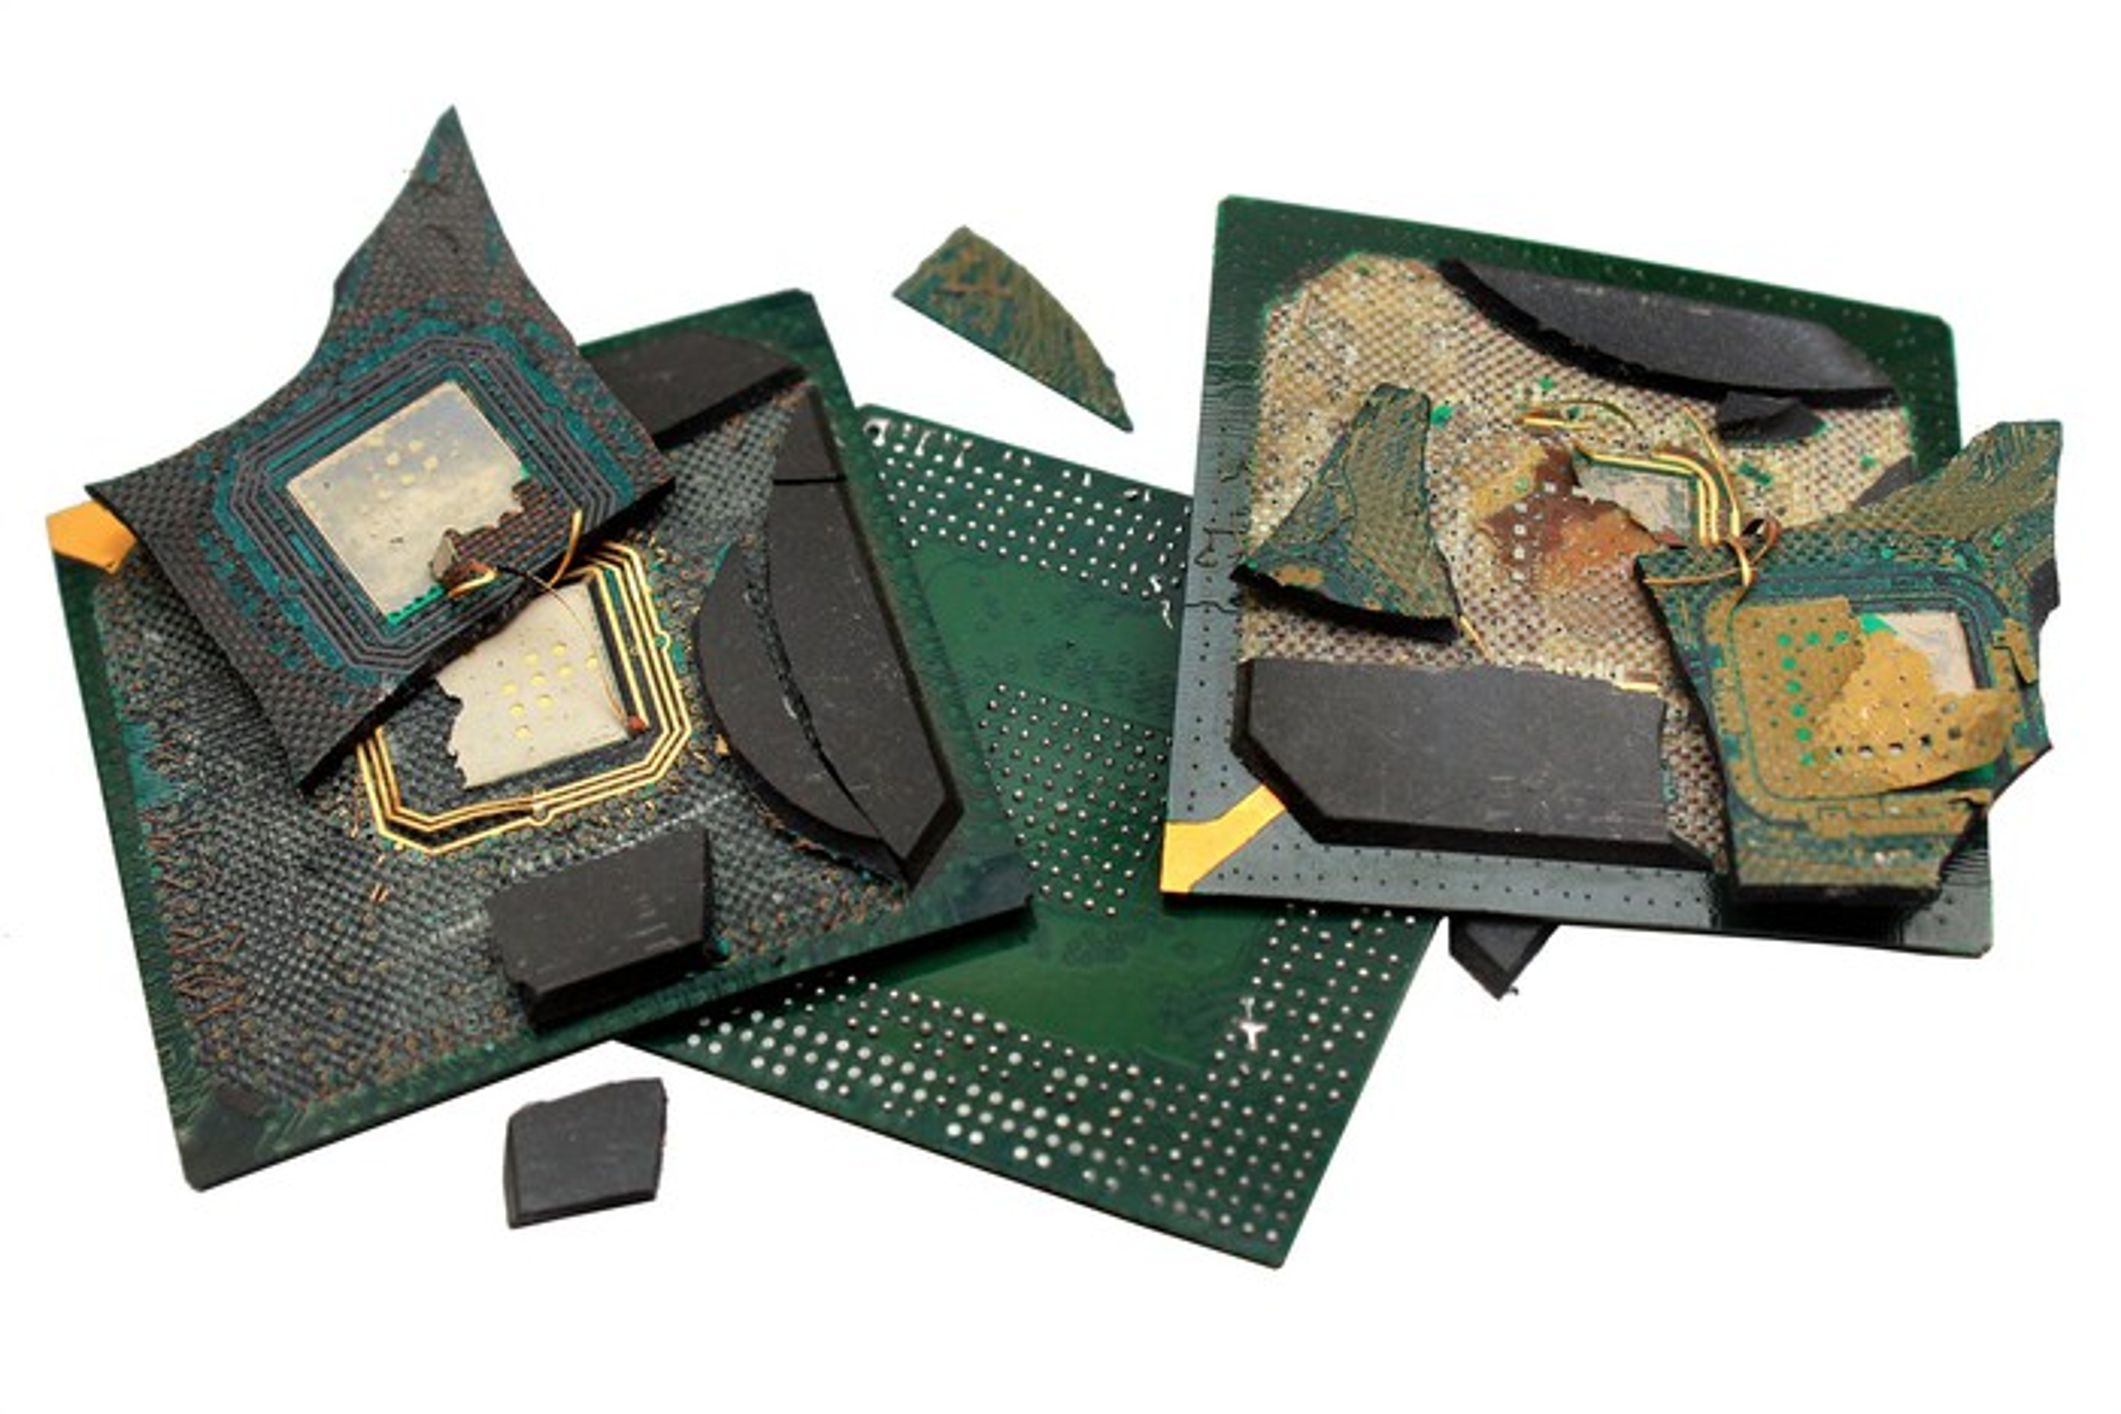 A loose pile of broken microchips.